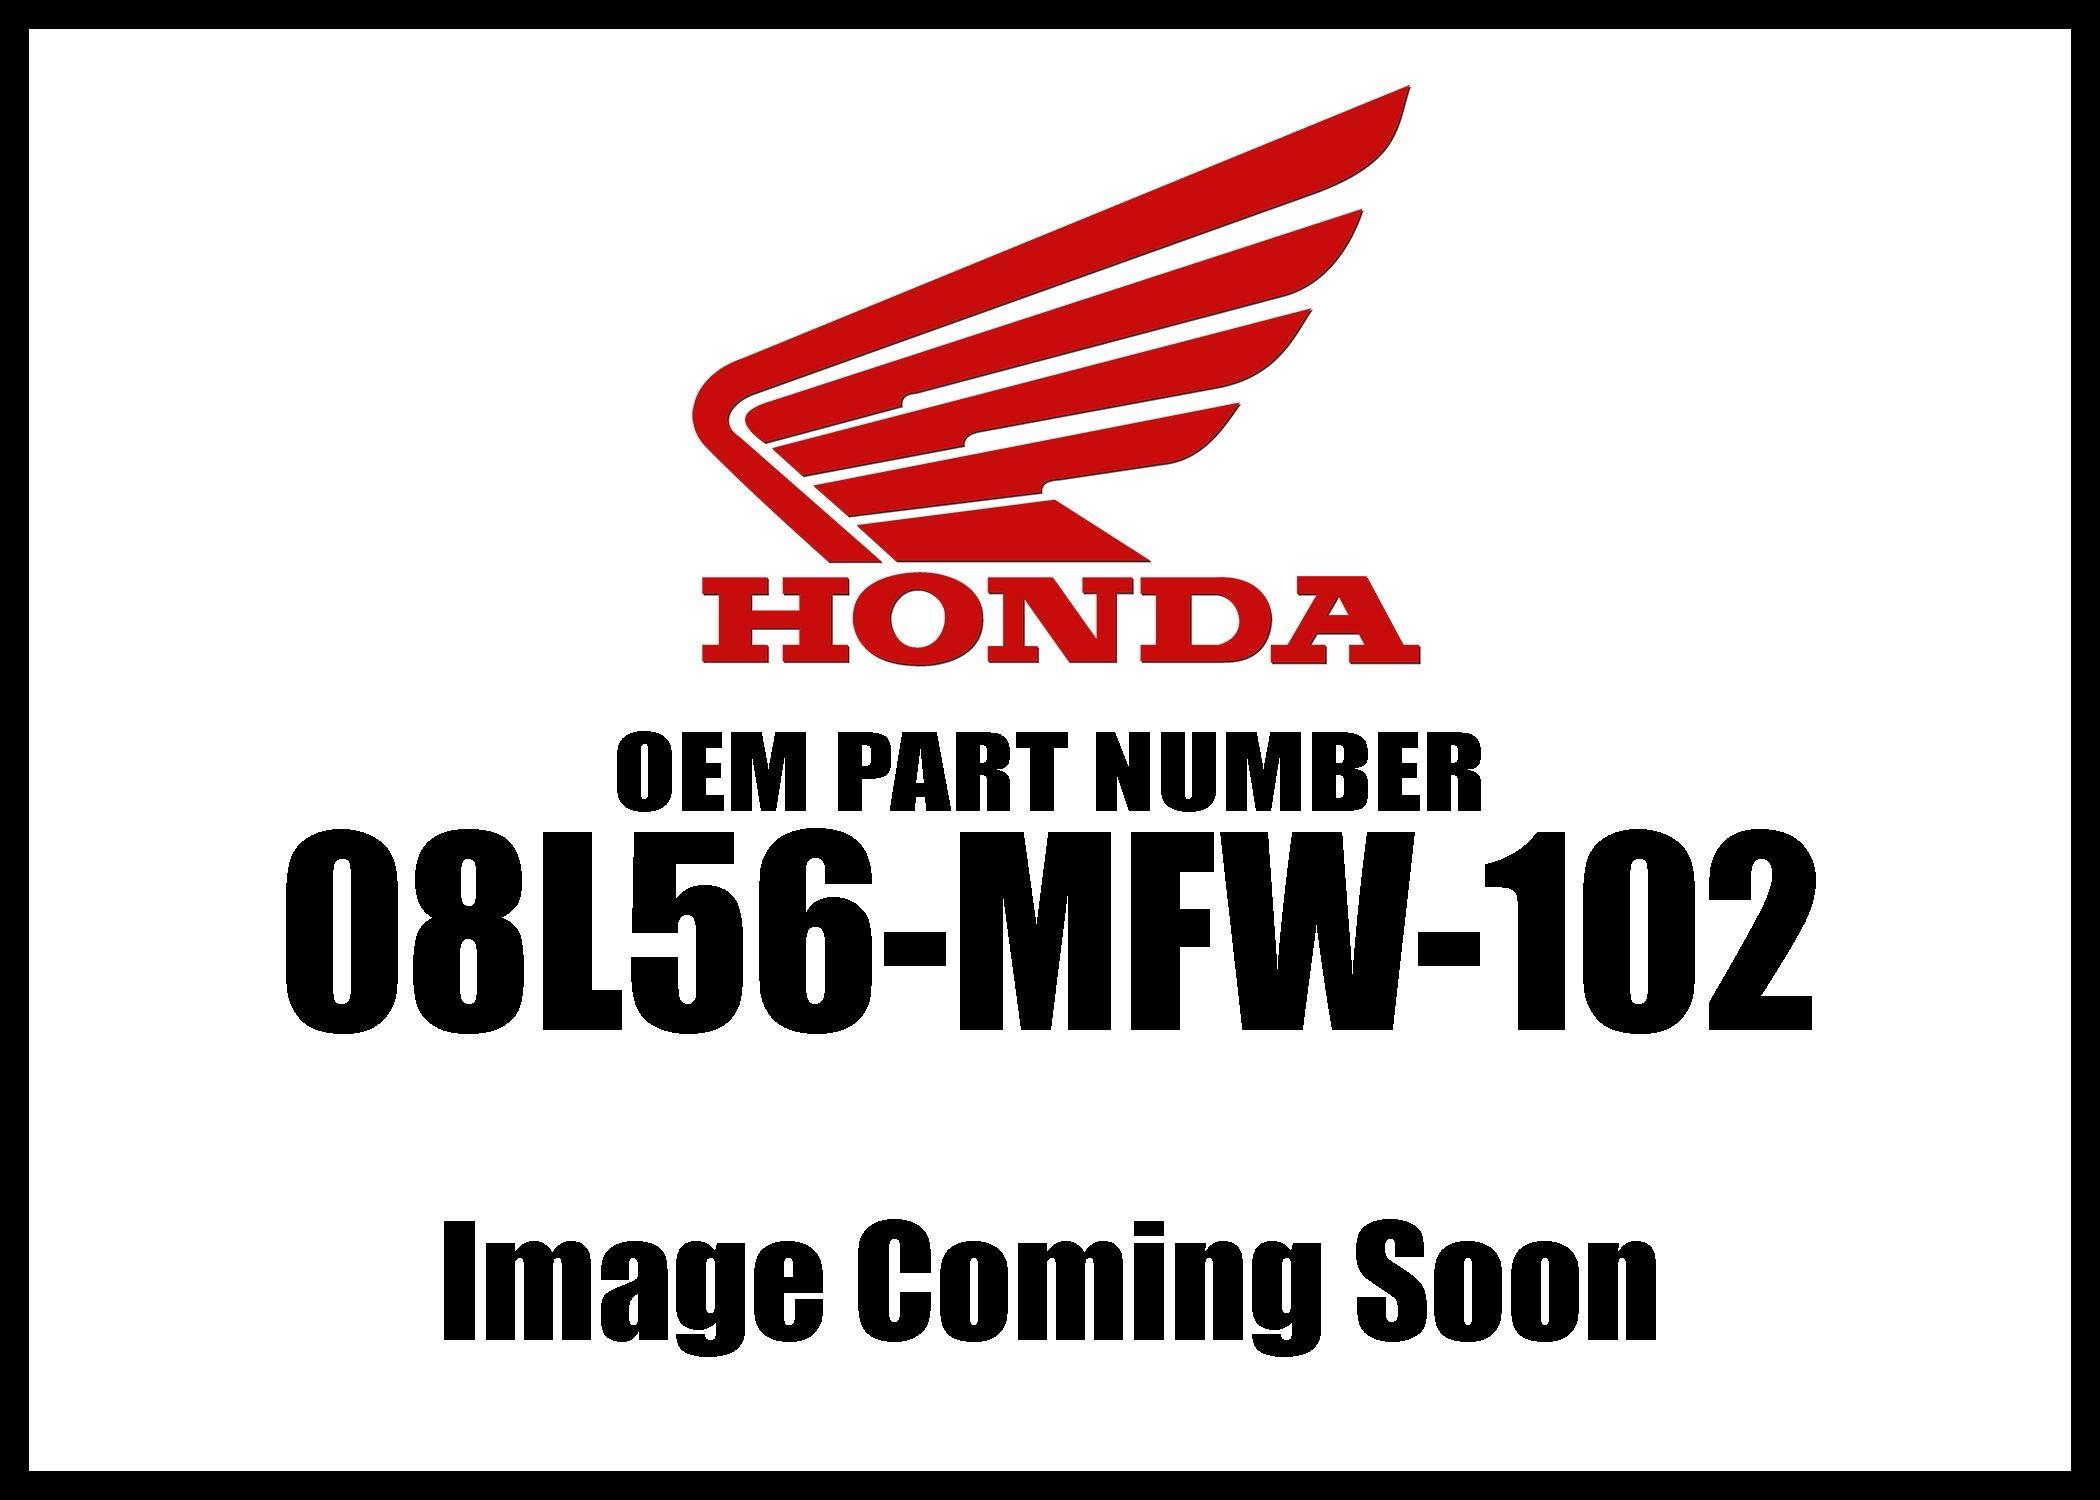 10-13 HONDA VT1300CS: Honda Genuine Accessories Saddlebag Mounting Brackets